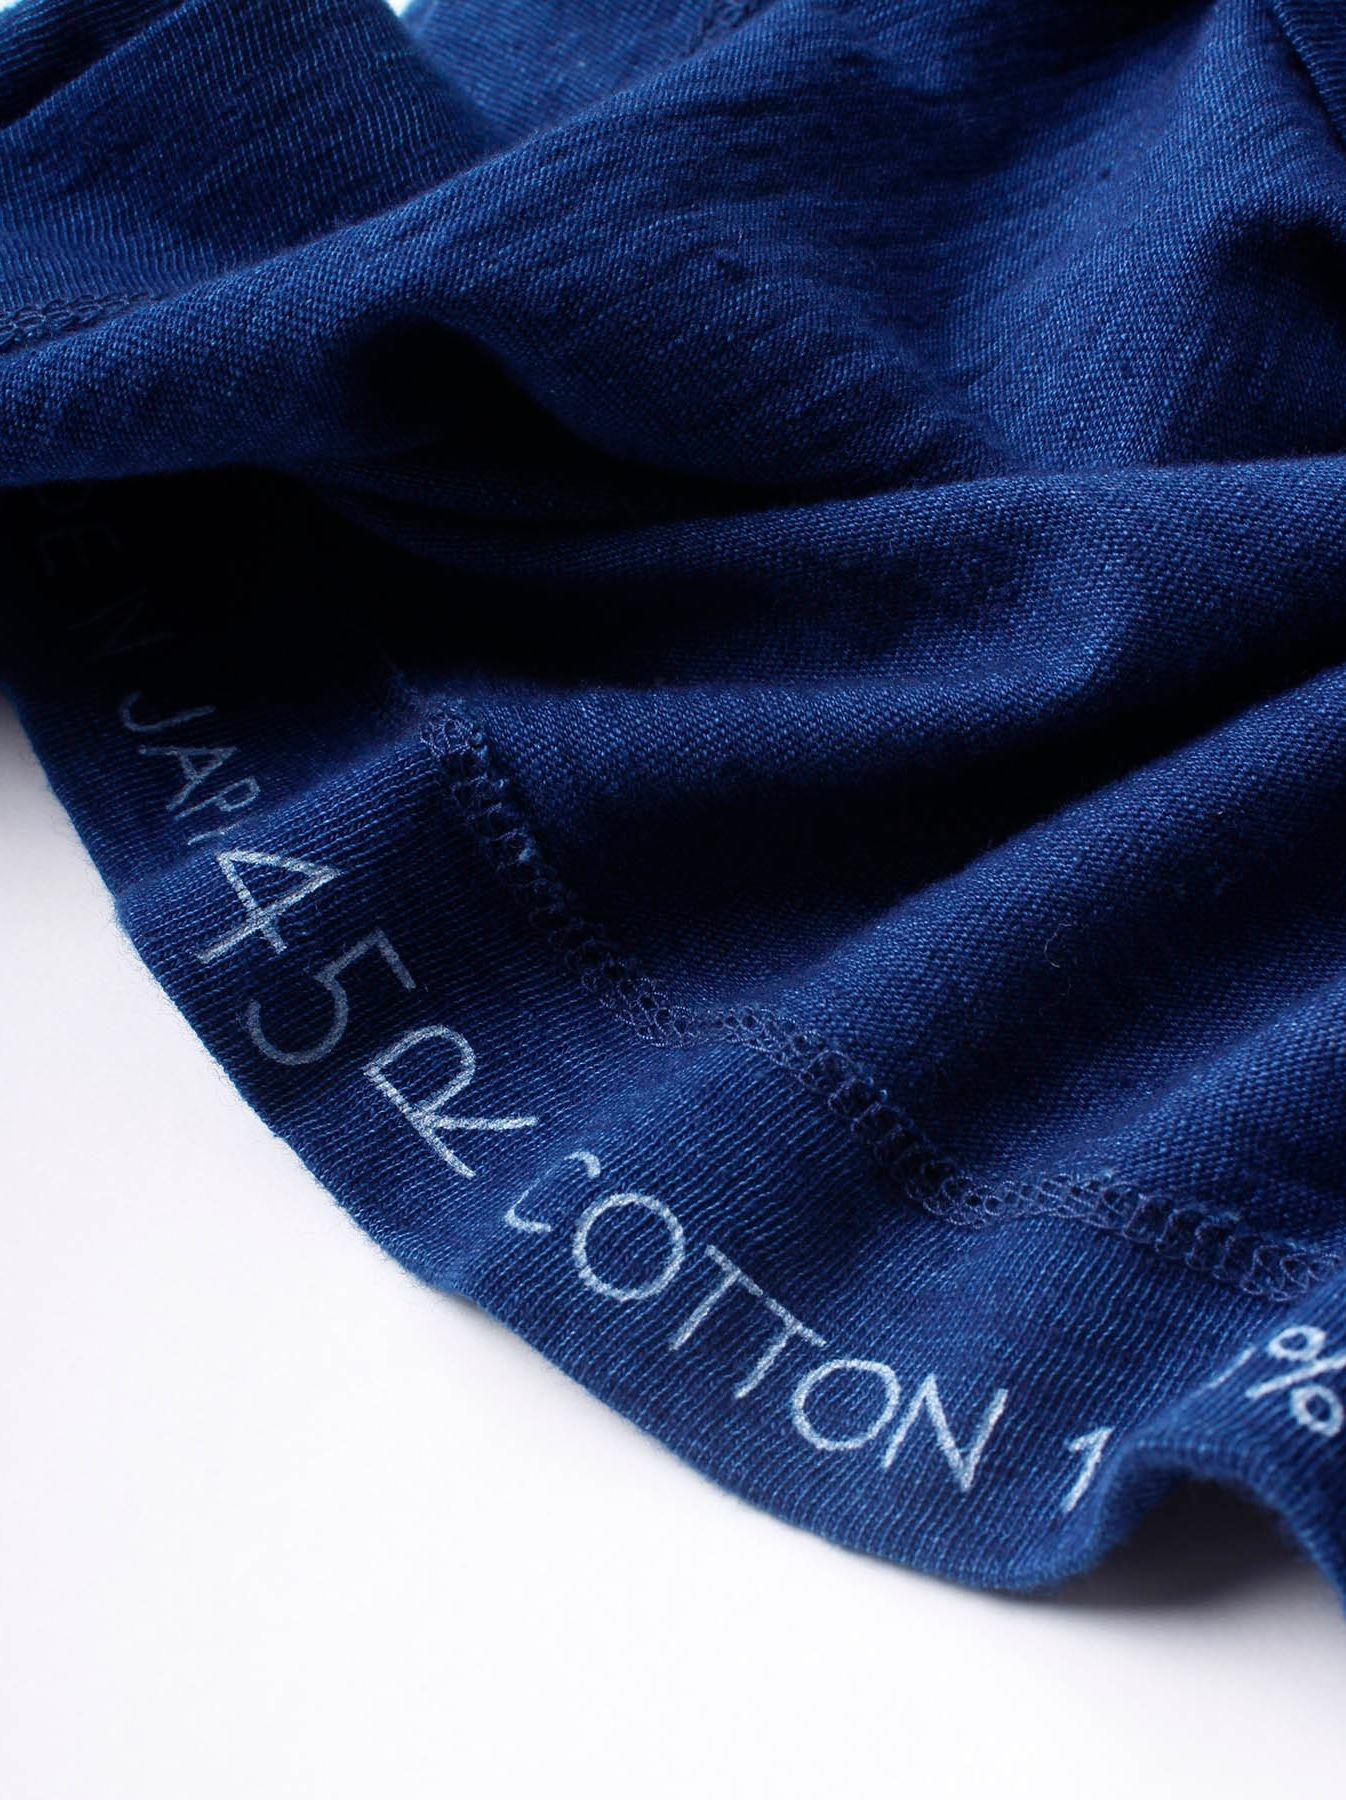 WH Indigo Ukiyo-e Kayak 45 Star T-shirt (Womens)-8